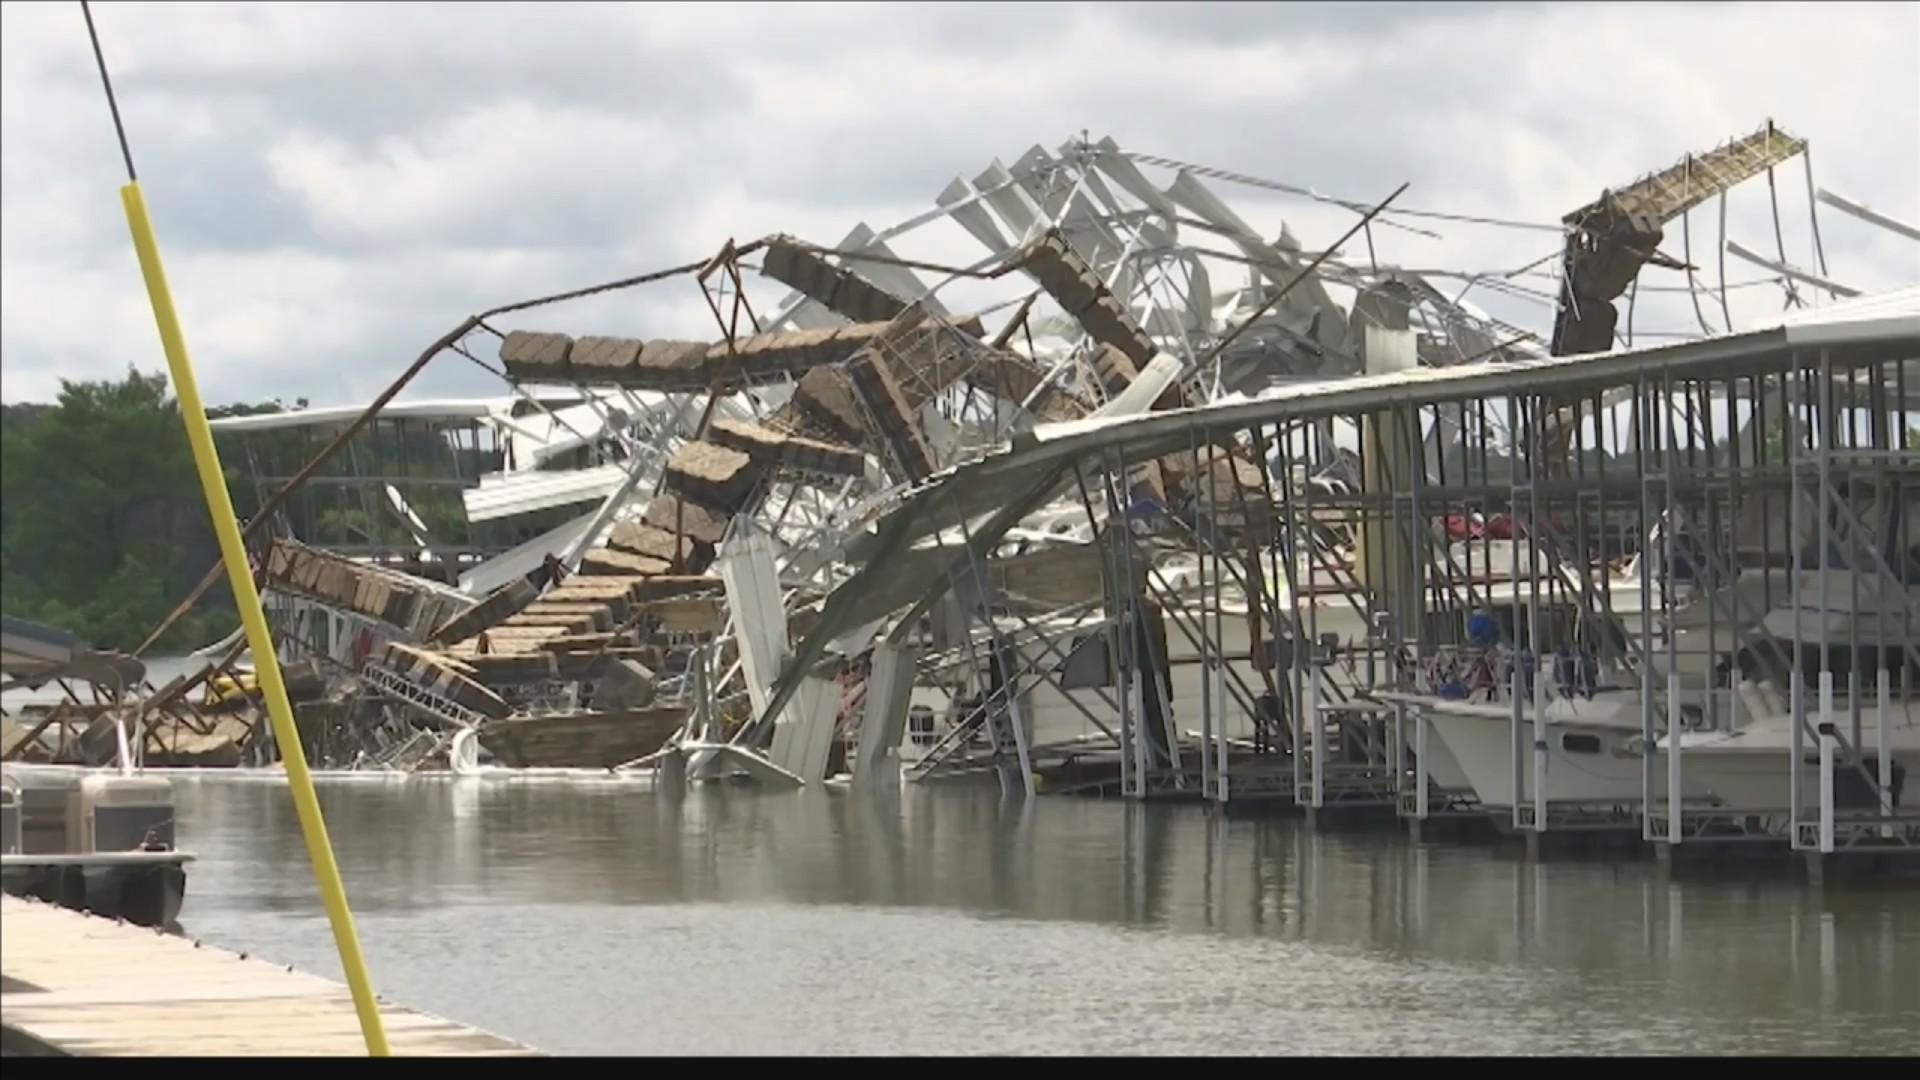 Storm_causes_major_damage_at_Kentucky_La_0_20190624235310